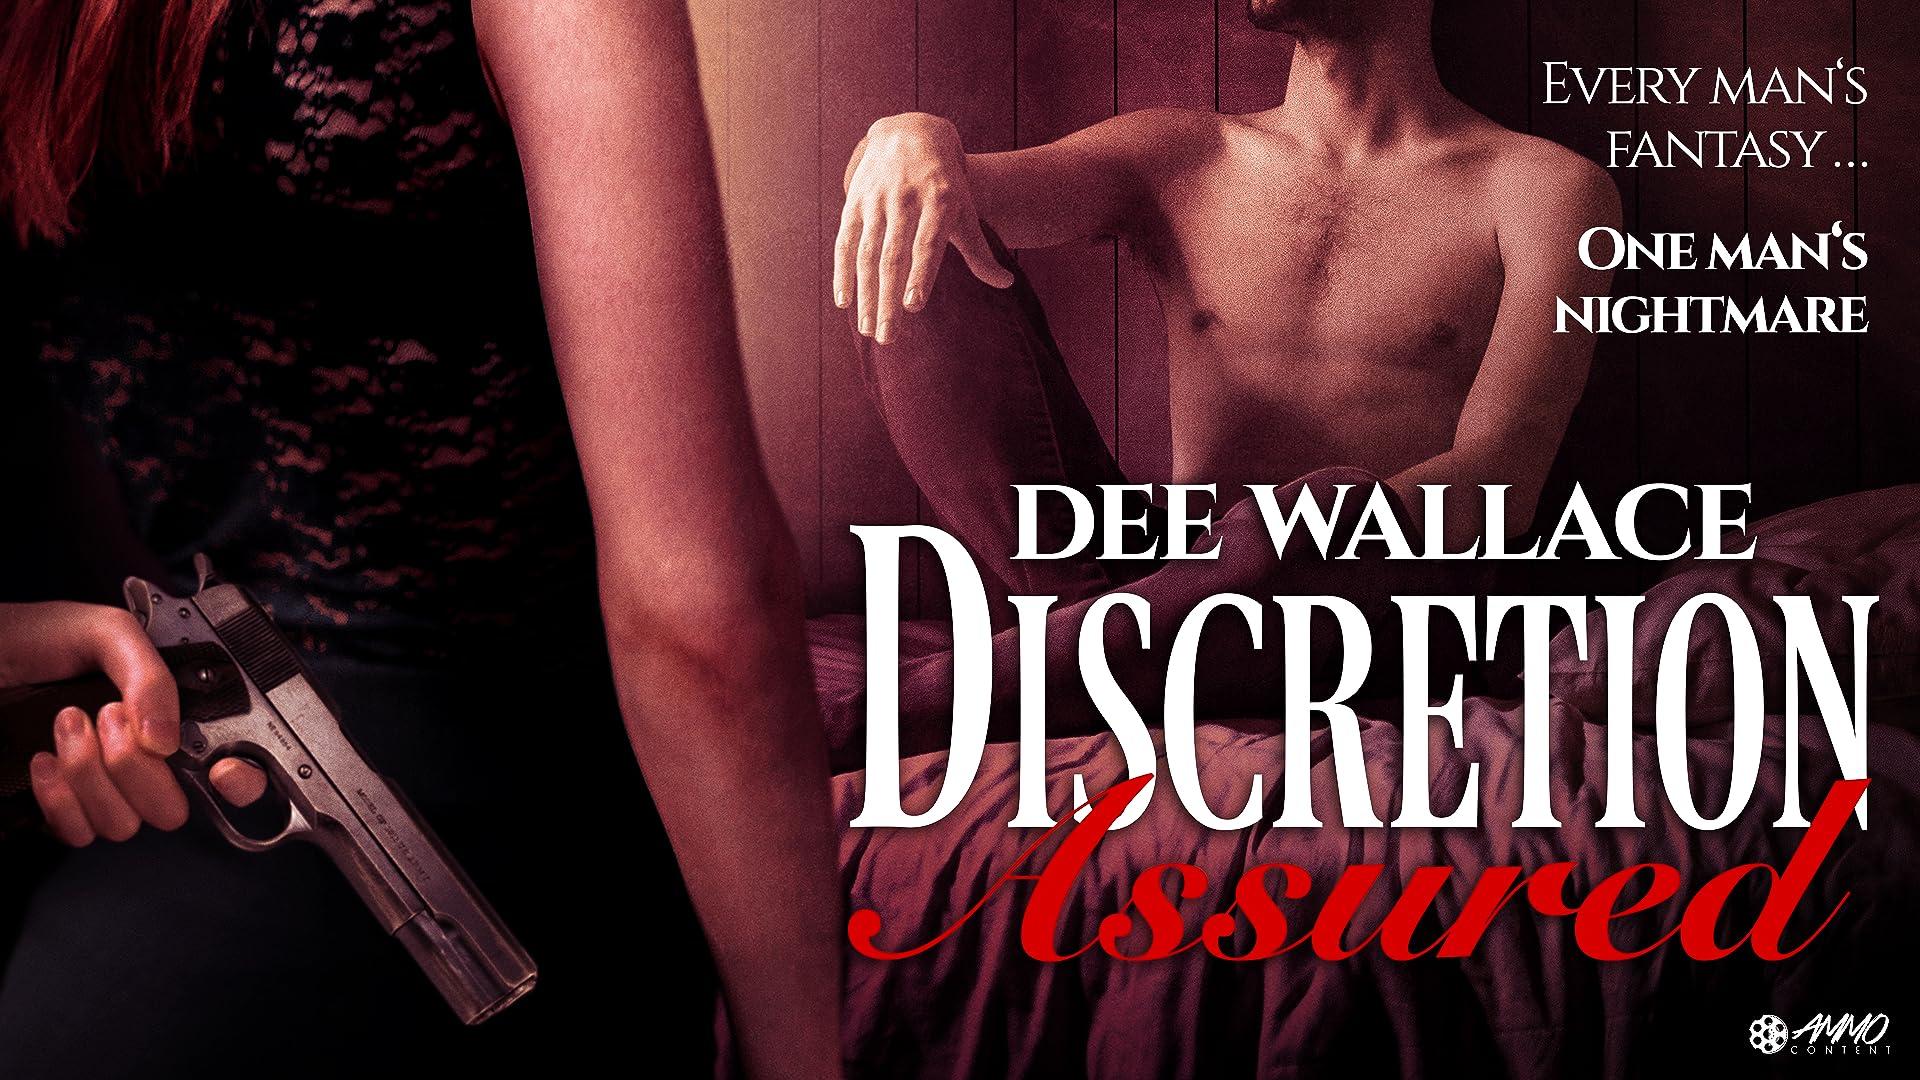 Discretion Assured